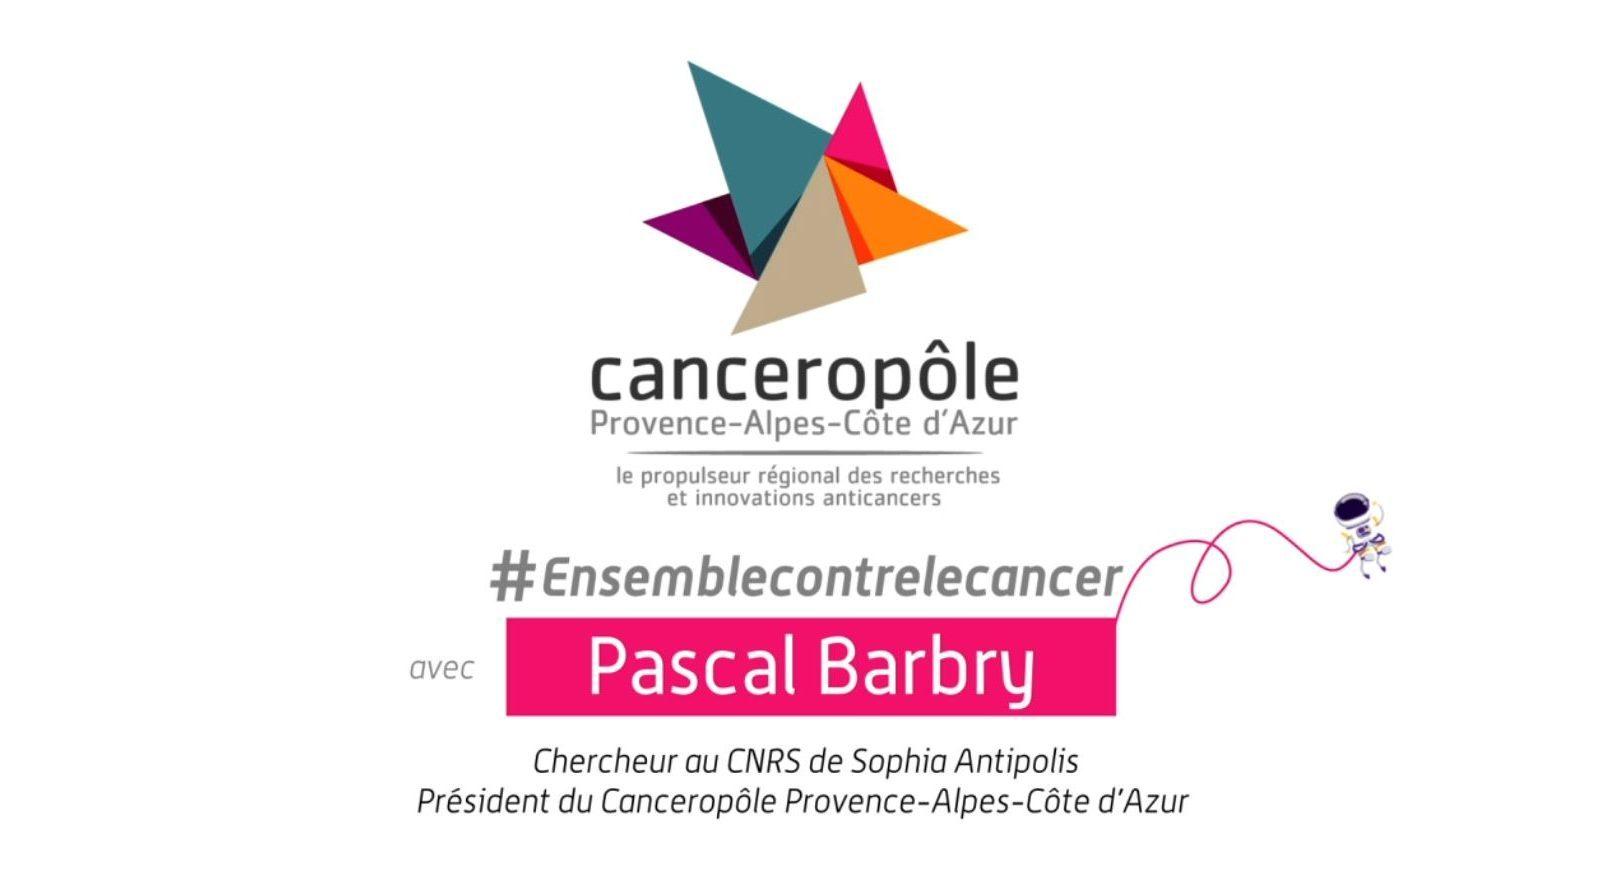 #Ensemblecontrelecancer / #Ensemblecheznous